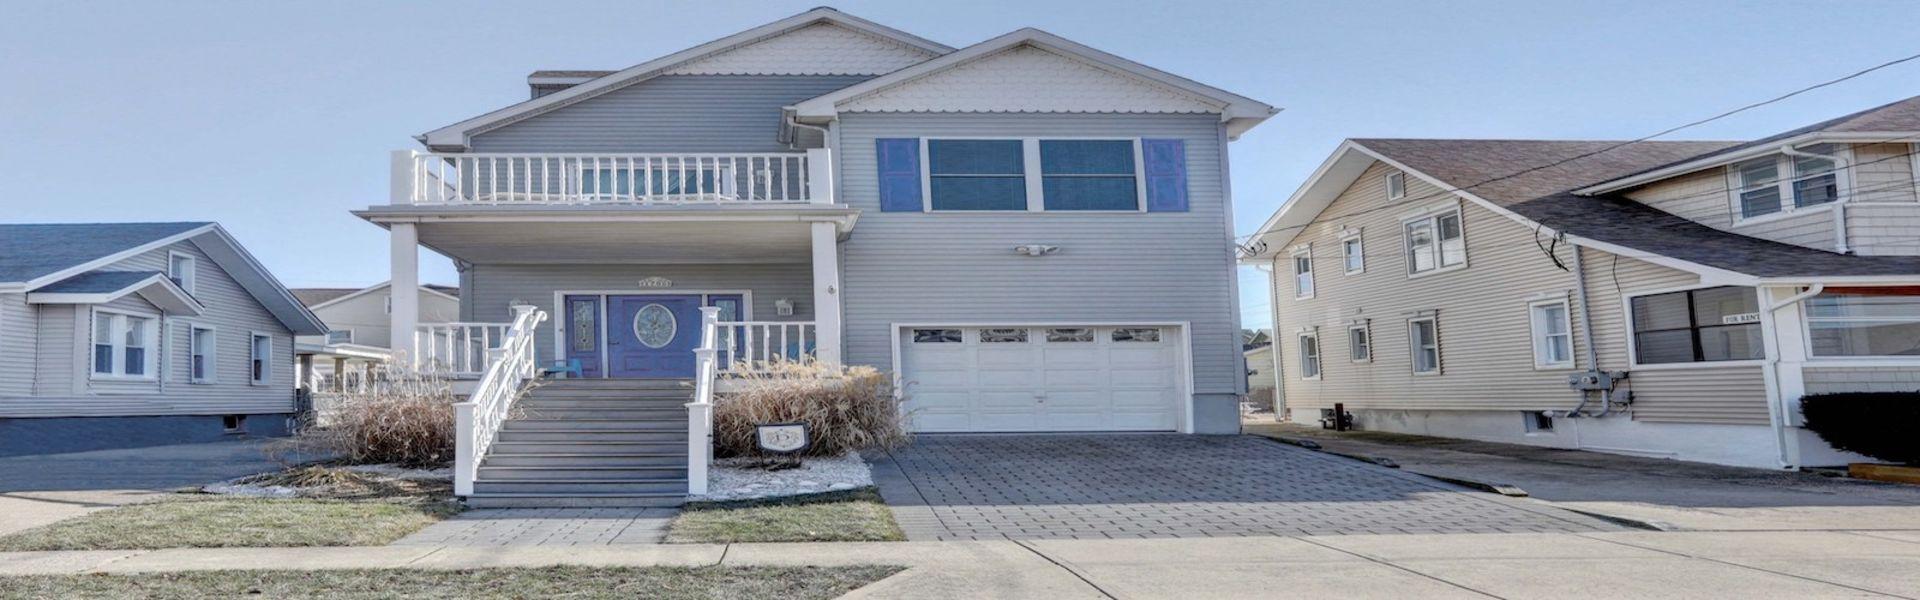 1706 A Street, Belmar, NJ 07719 – $775,000